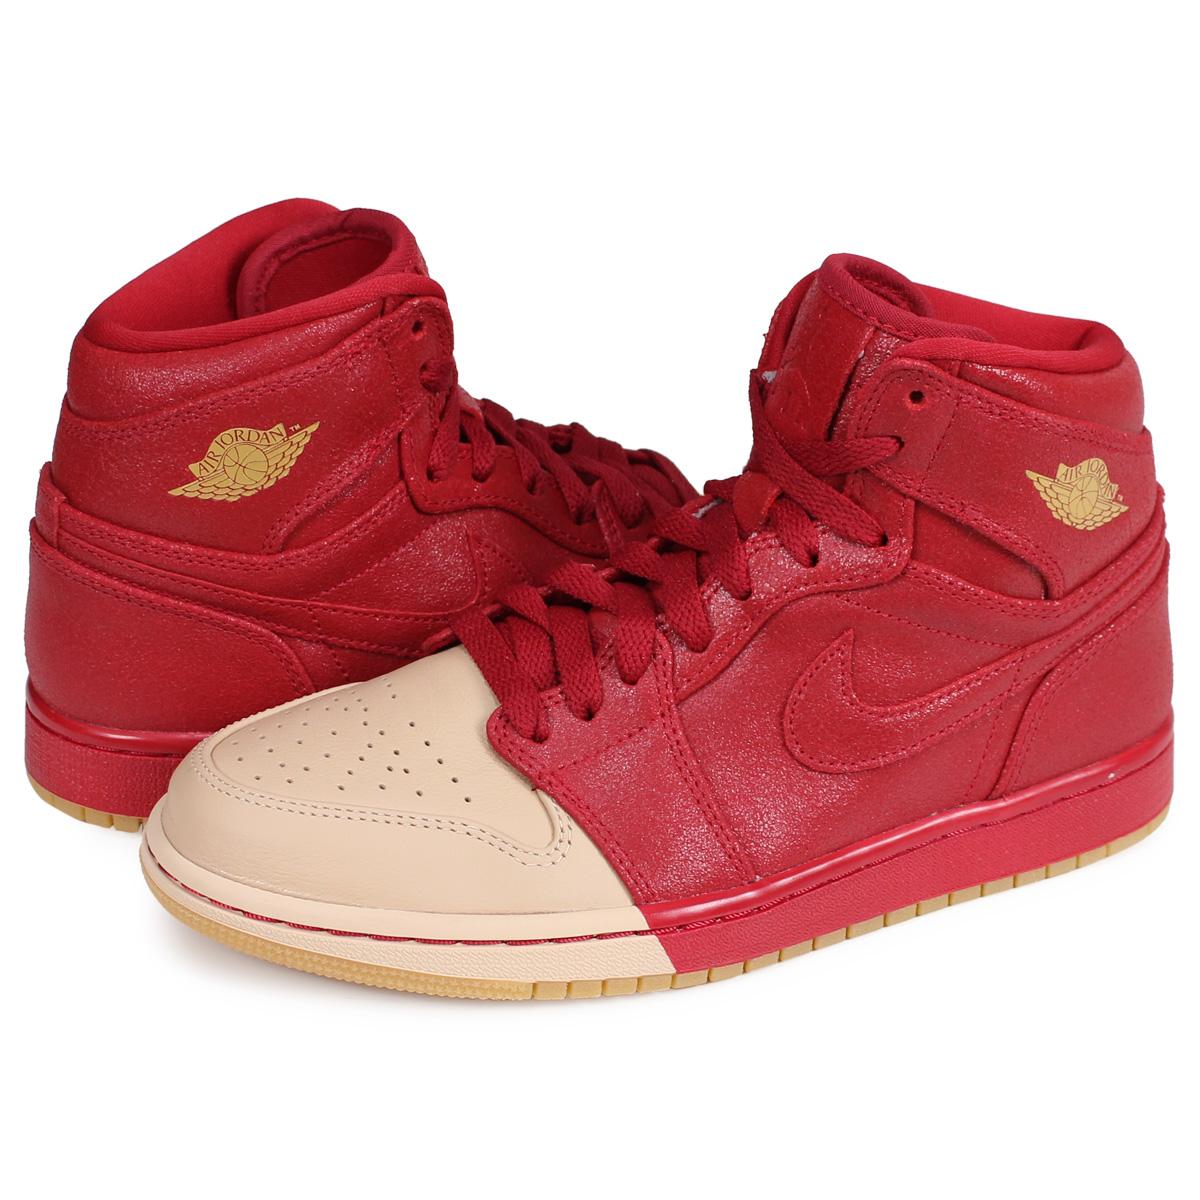 a65cf7214e2 ALLSPORTS  Nike NIKE Air Jordan 1 nostalgic high sneakers Lady s WMNS AIR  JORDAN 1 RETRO HIGH red AH7389-607  2 21 Shinnyu load   192